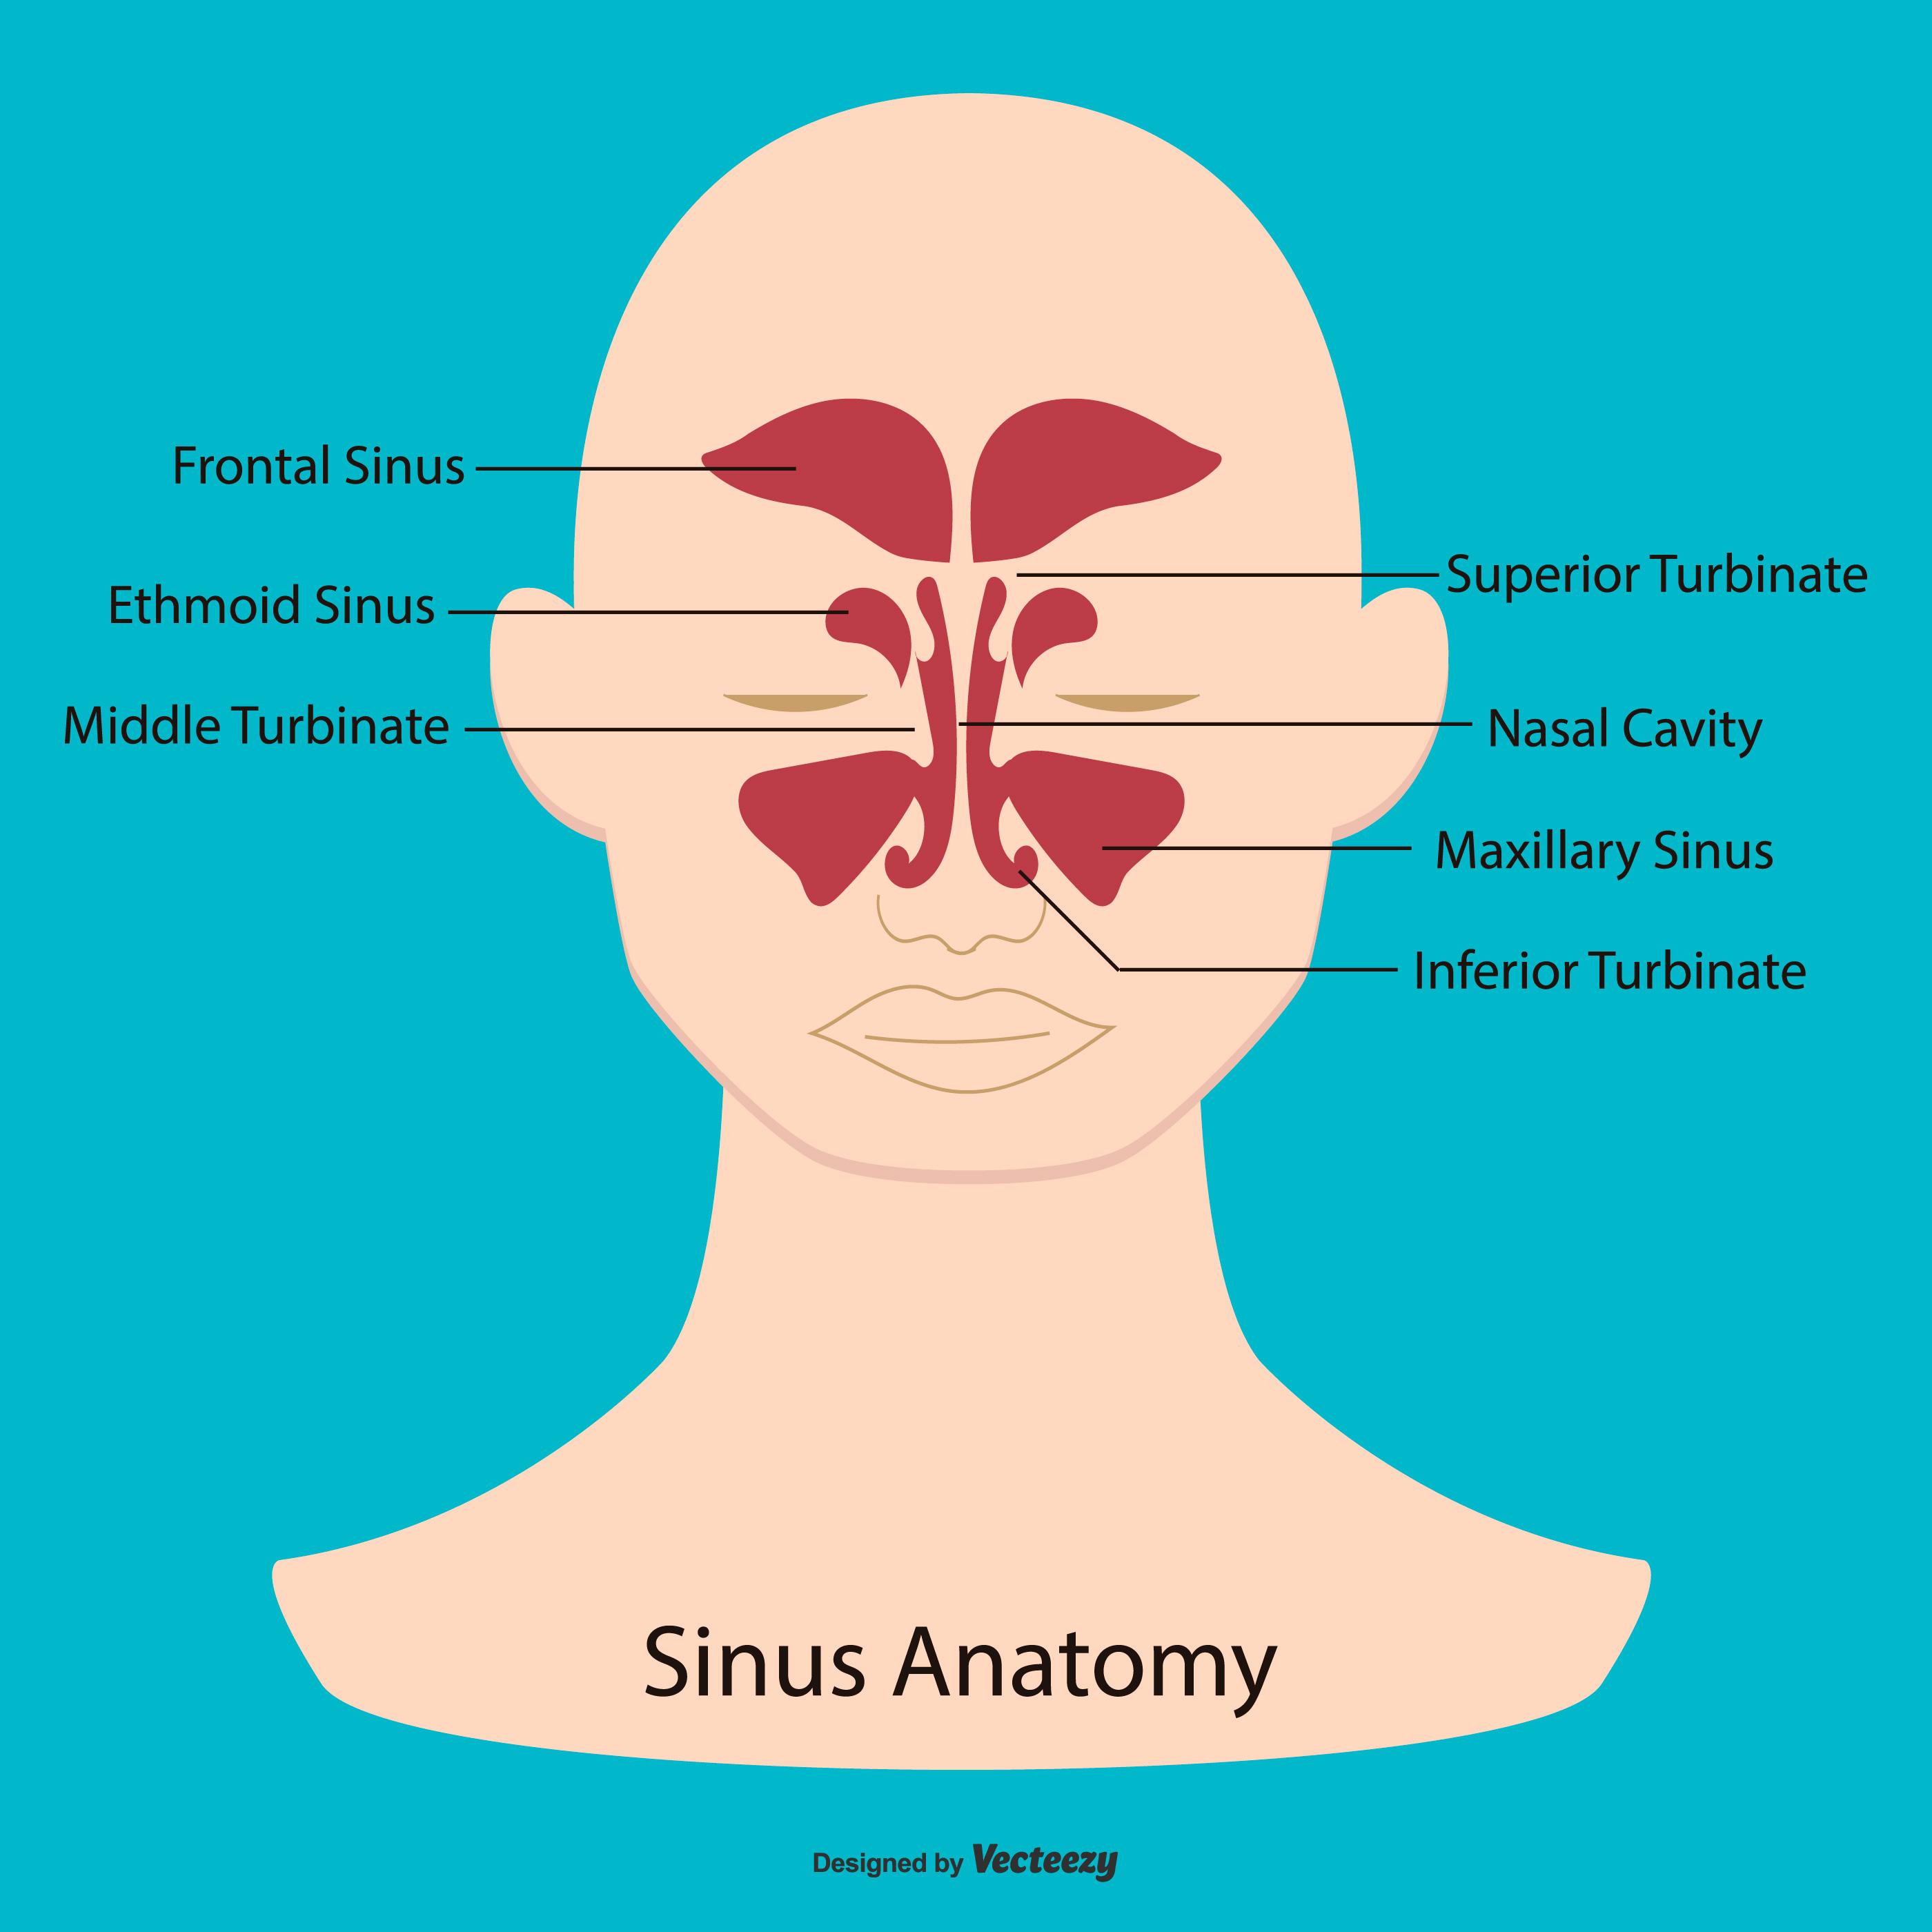 Sinus-Anatomie-Illustration - Kostenlose Vektor-Kunst, Archiv ...